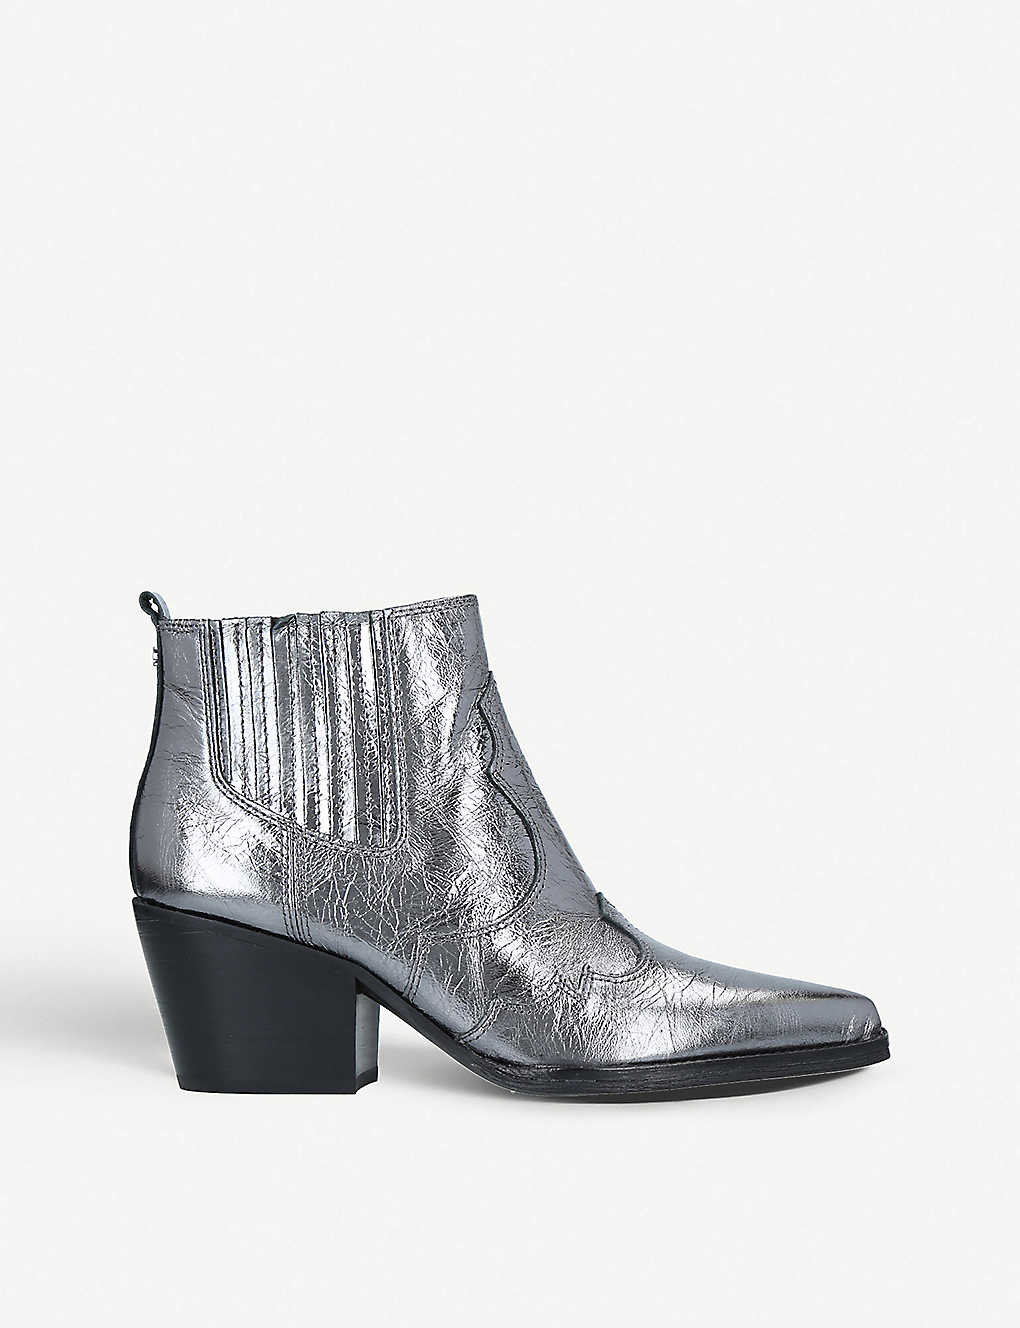 61084b2d1 SAM EDELMAN - Winona metallic western chelsea boots   Selfridges.com